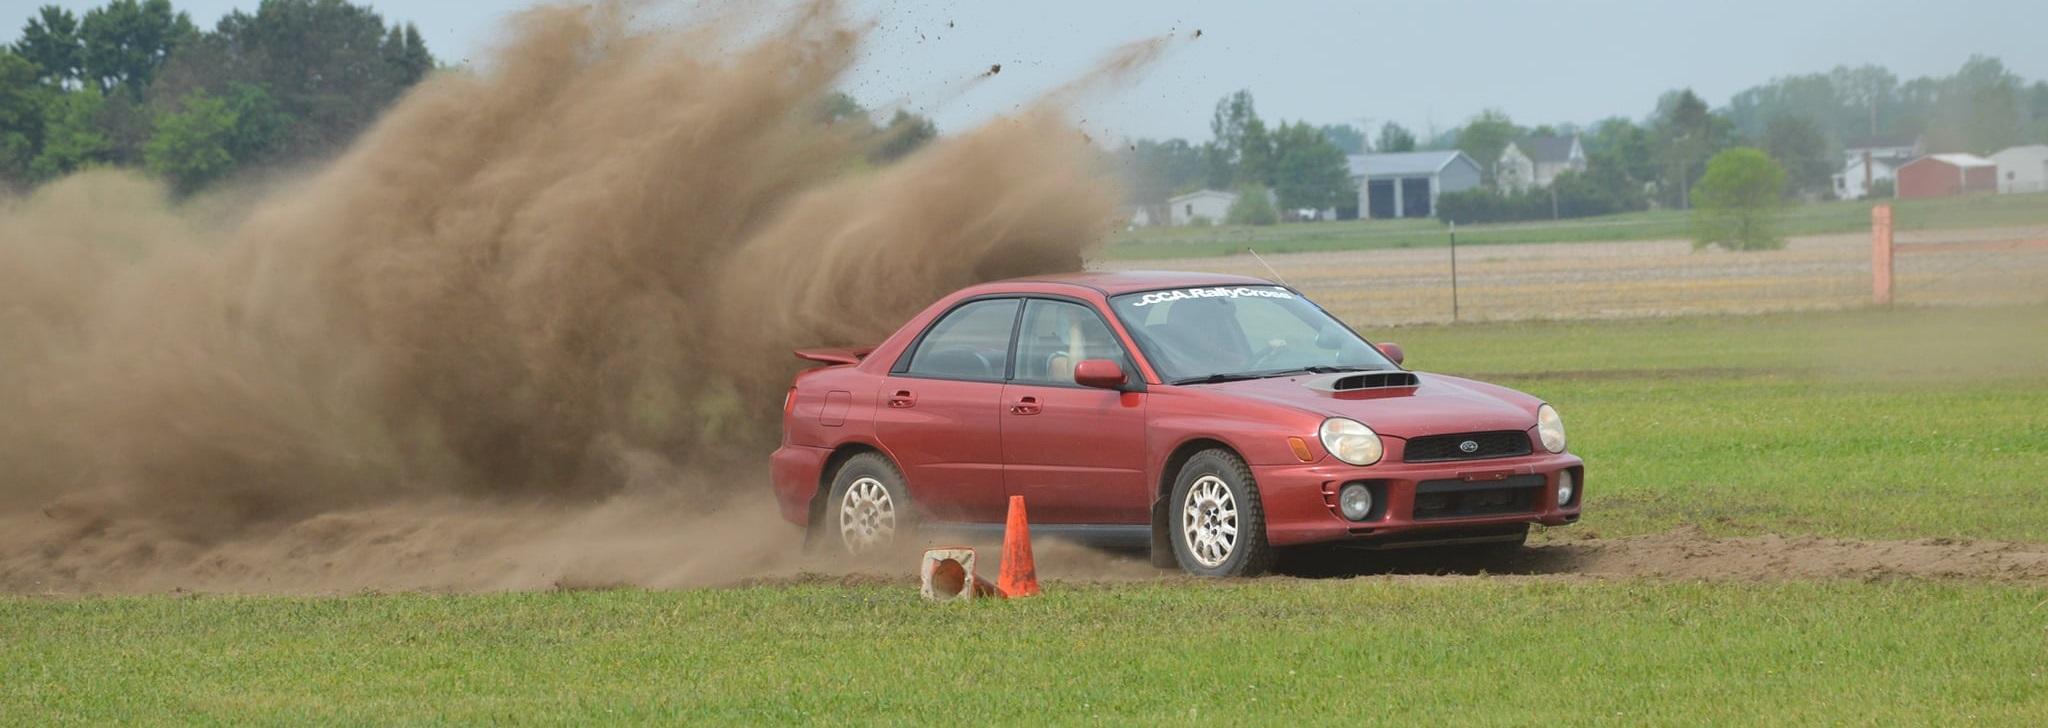 New RallyCross Venue Aquired